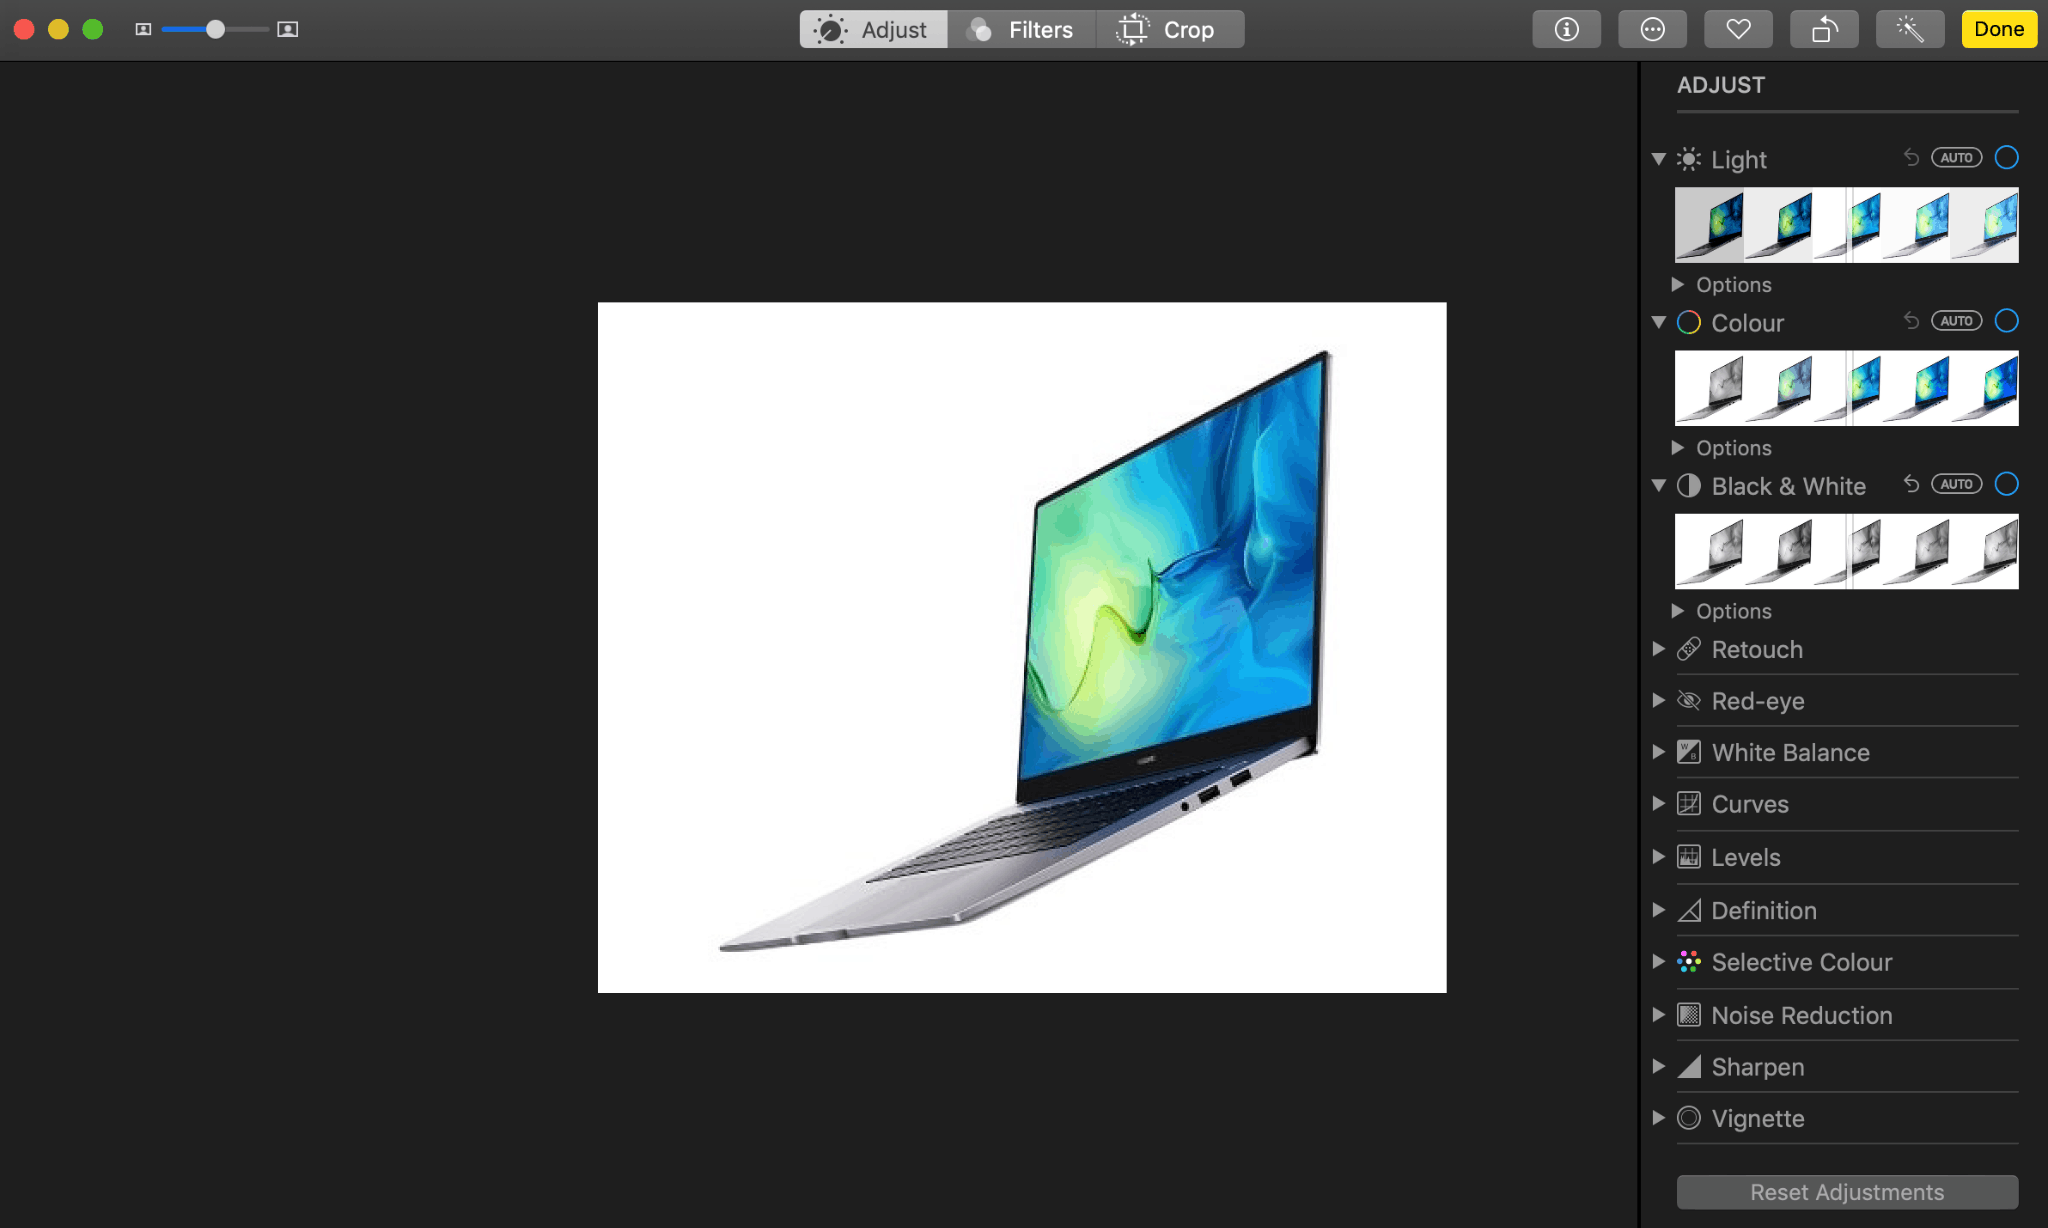 how to edit photos on macbook air